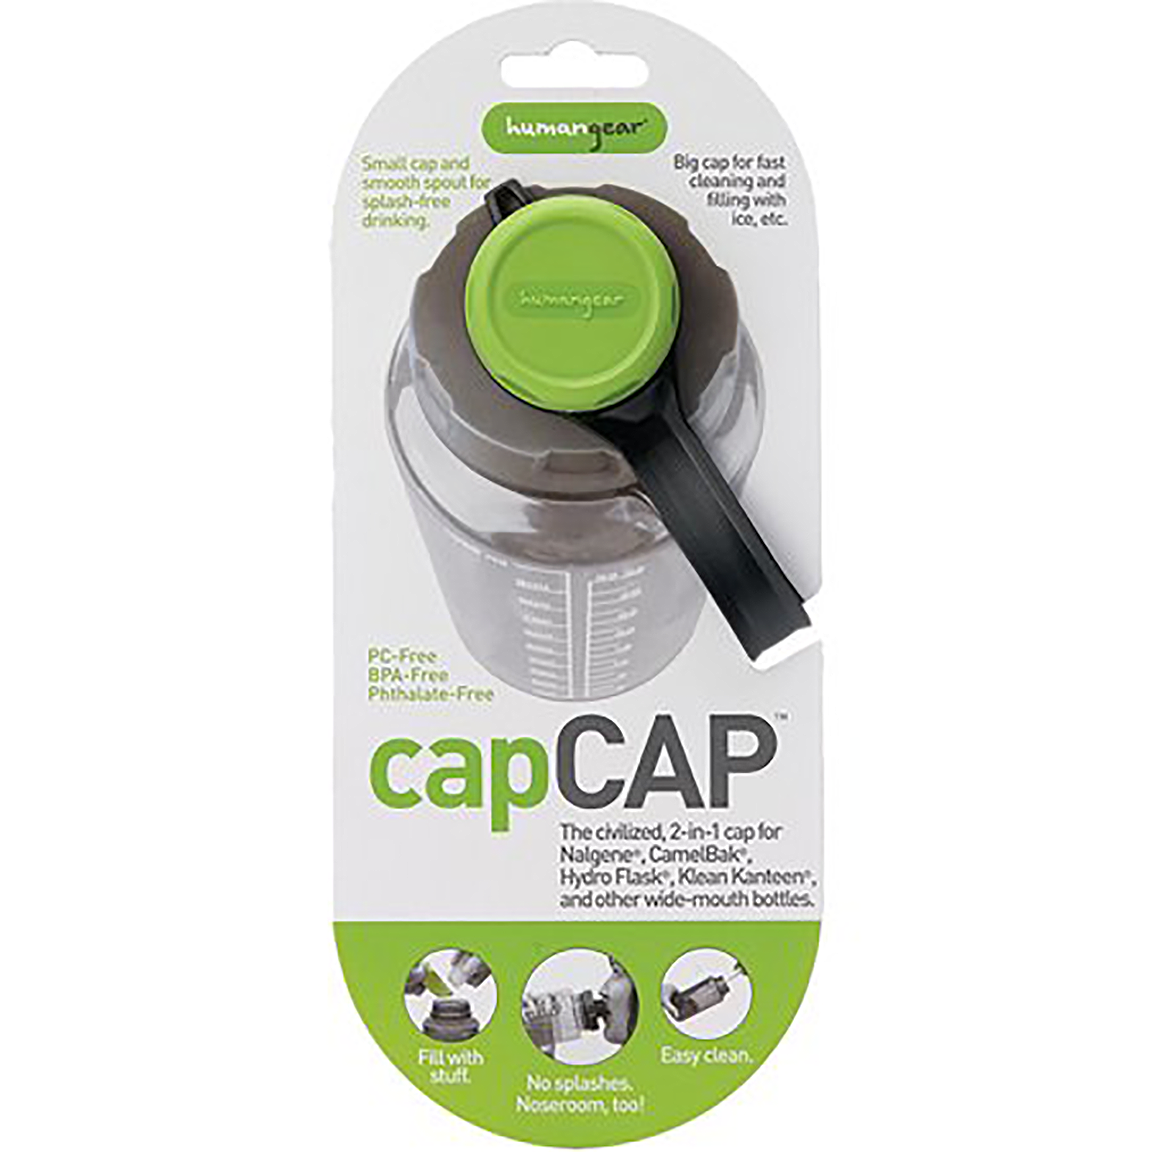 CAPCAP 2.0 GREEN/GRAY-1